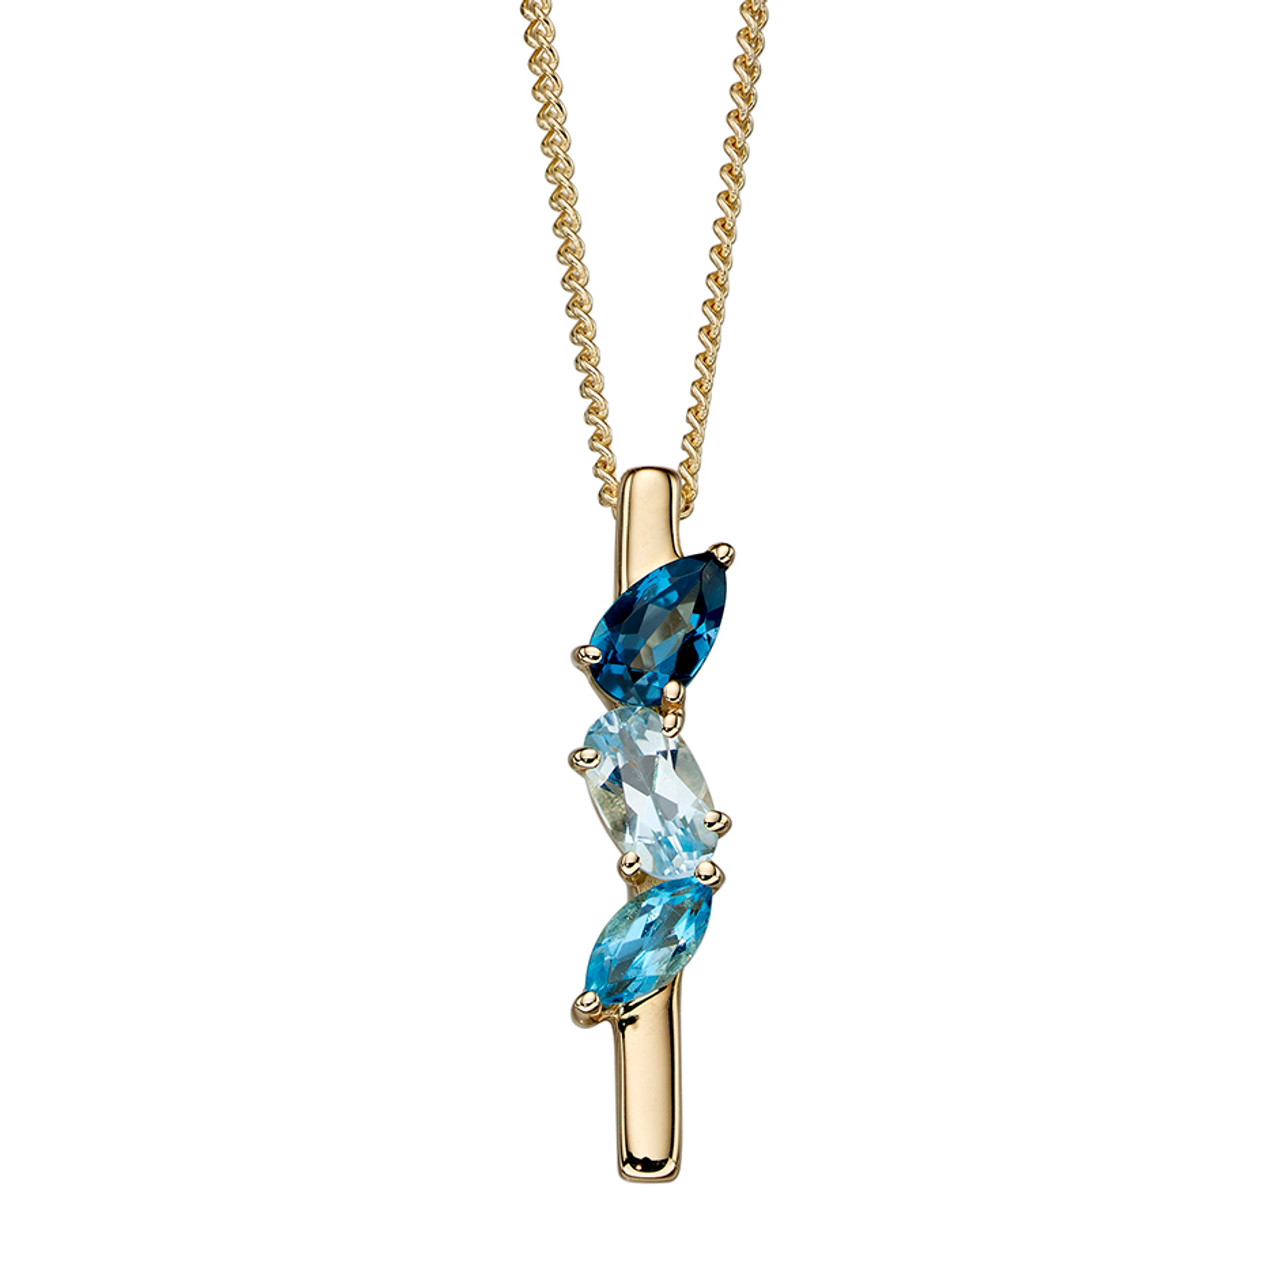 c626ad91069 9ct Yellow Gold Blue Topaz bar Pendant on Chain